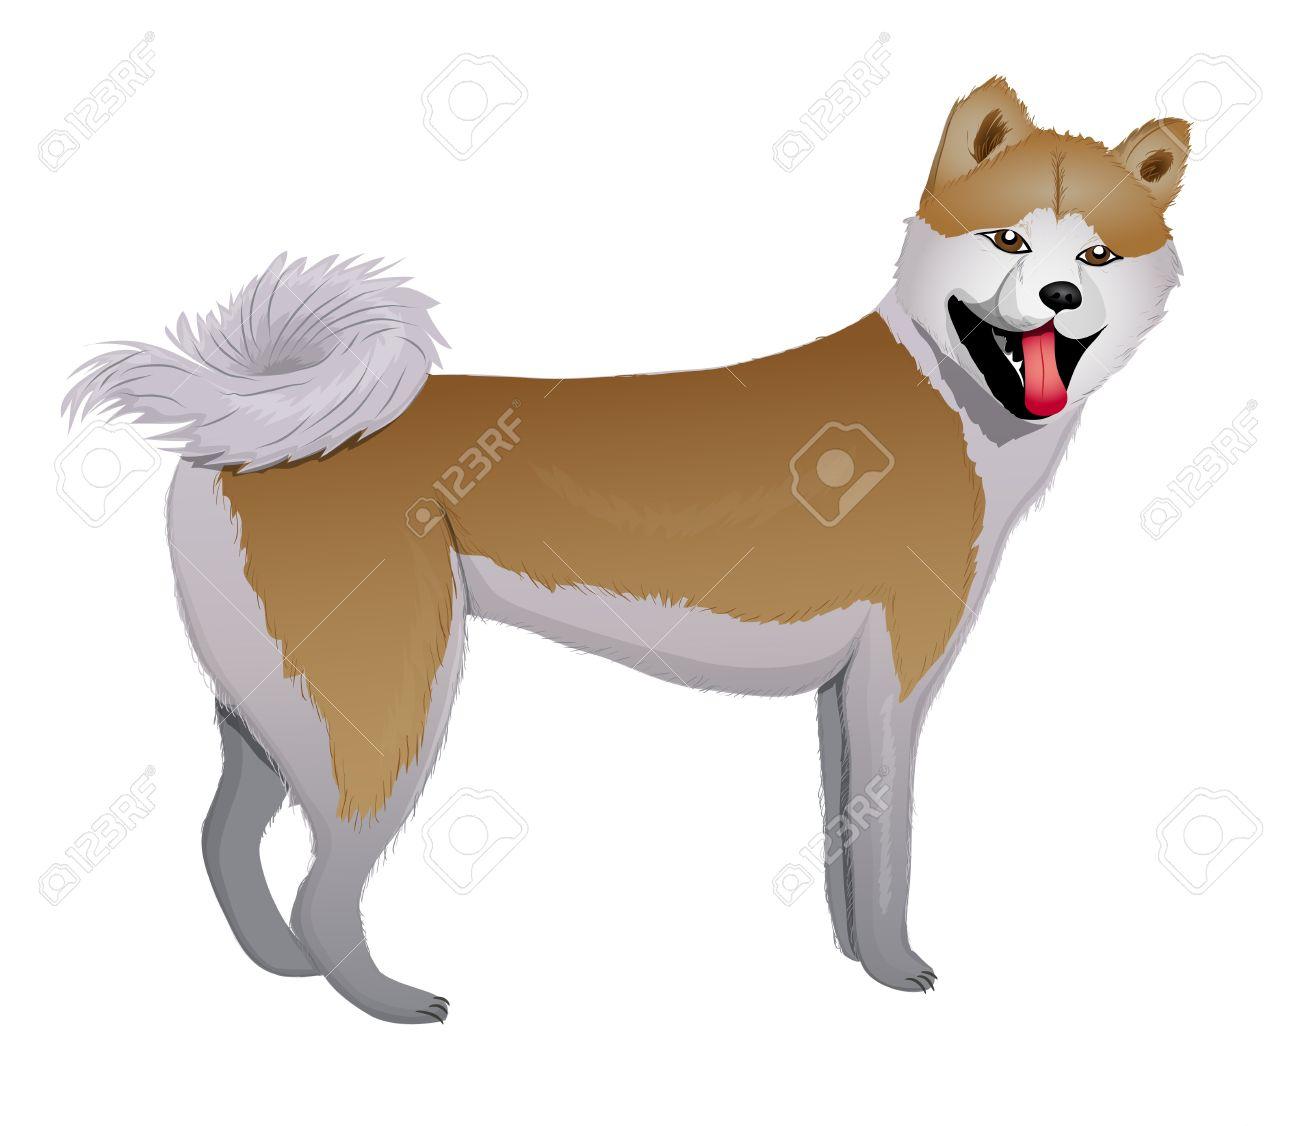 Akita Inu Japanese Dog vector illustration eps 10 Stock Vector - 12491151